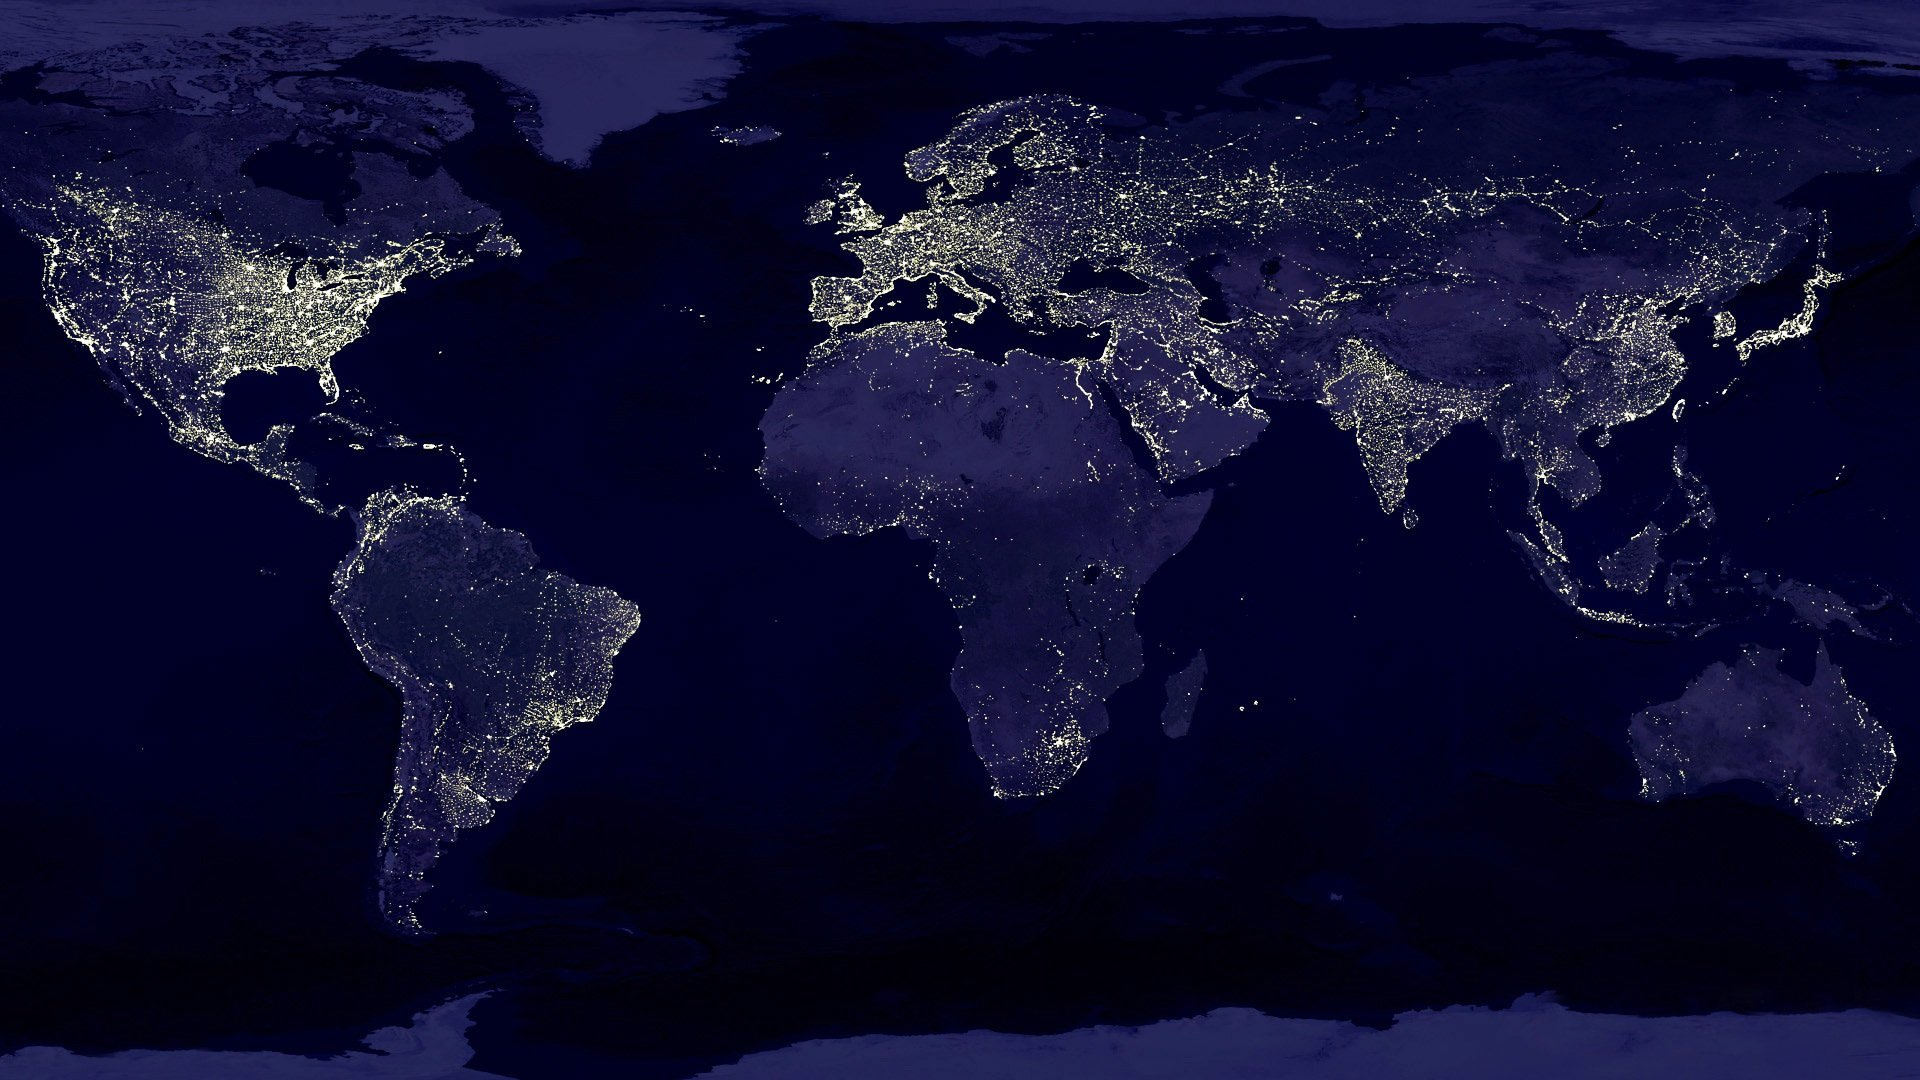 World Map wallpapers 1920x1080 Full HD (1080p) desktop backgrounds